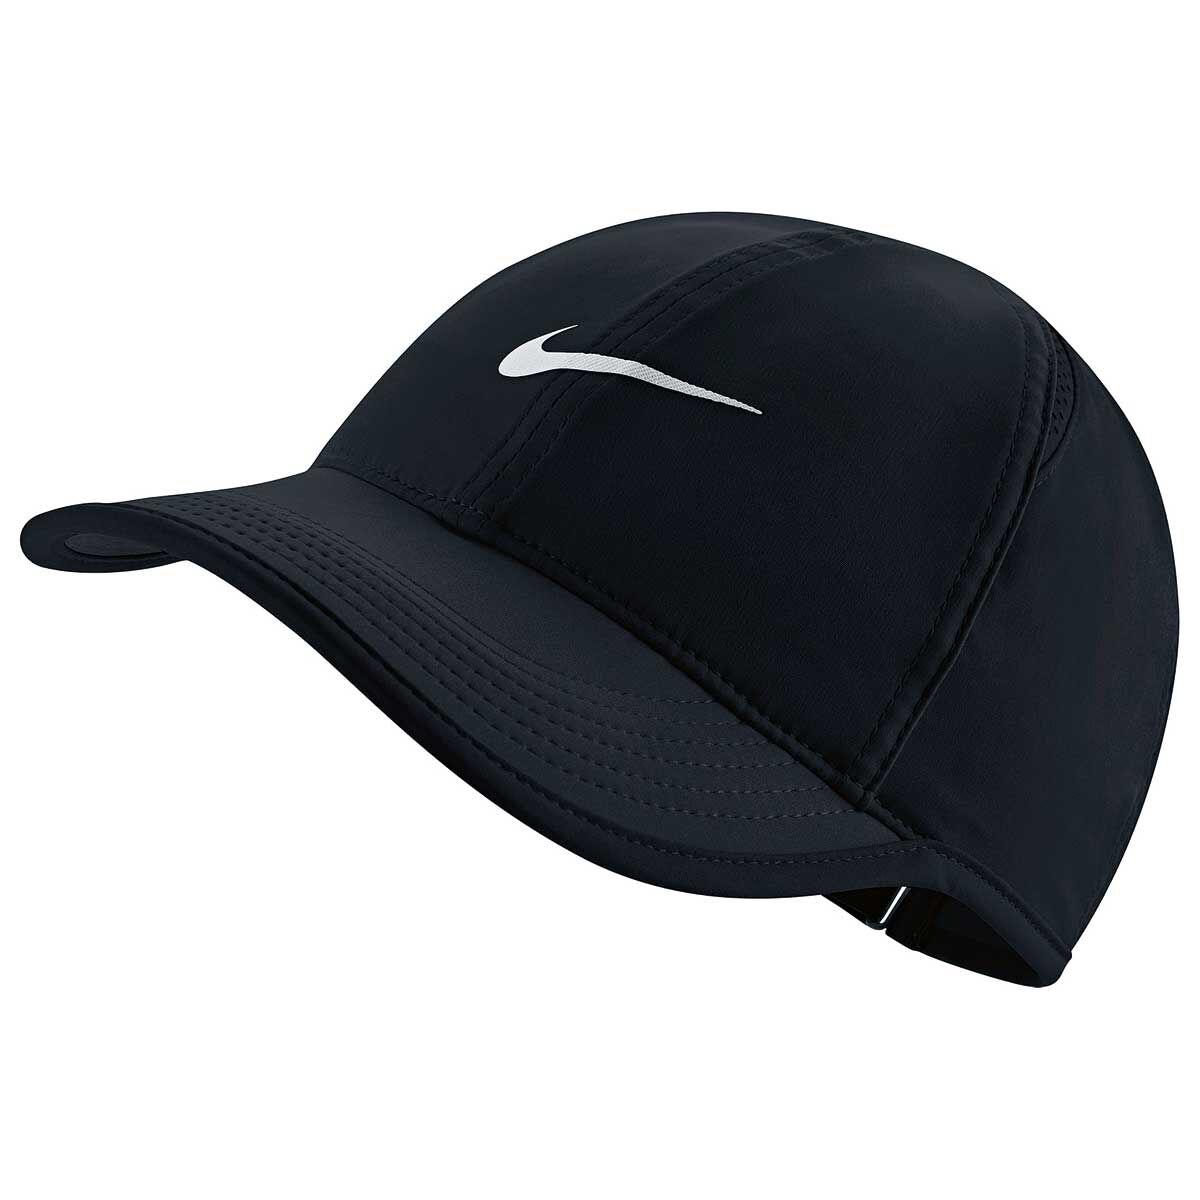 pretty nice 7ddd9 010b3 ... low price nike womens featherlight cap black white osfa rebelhi res  94eda 49e87